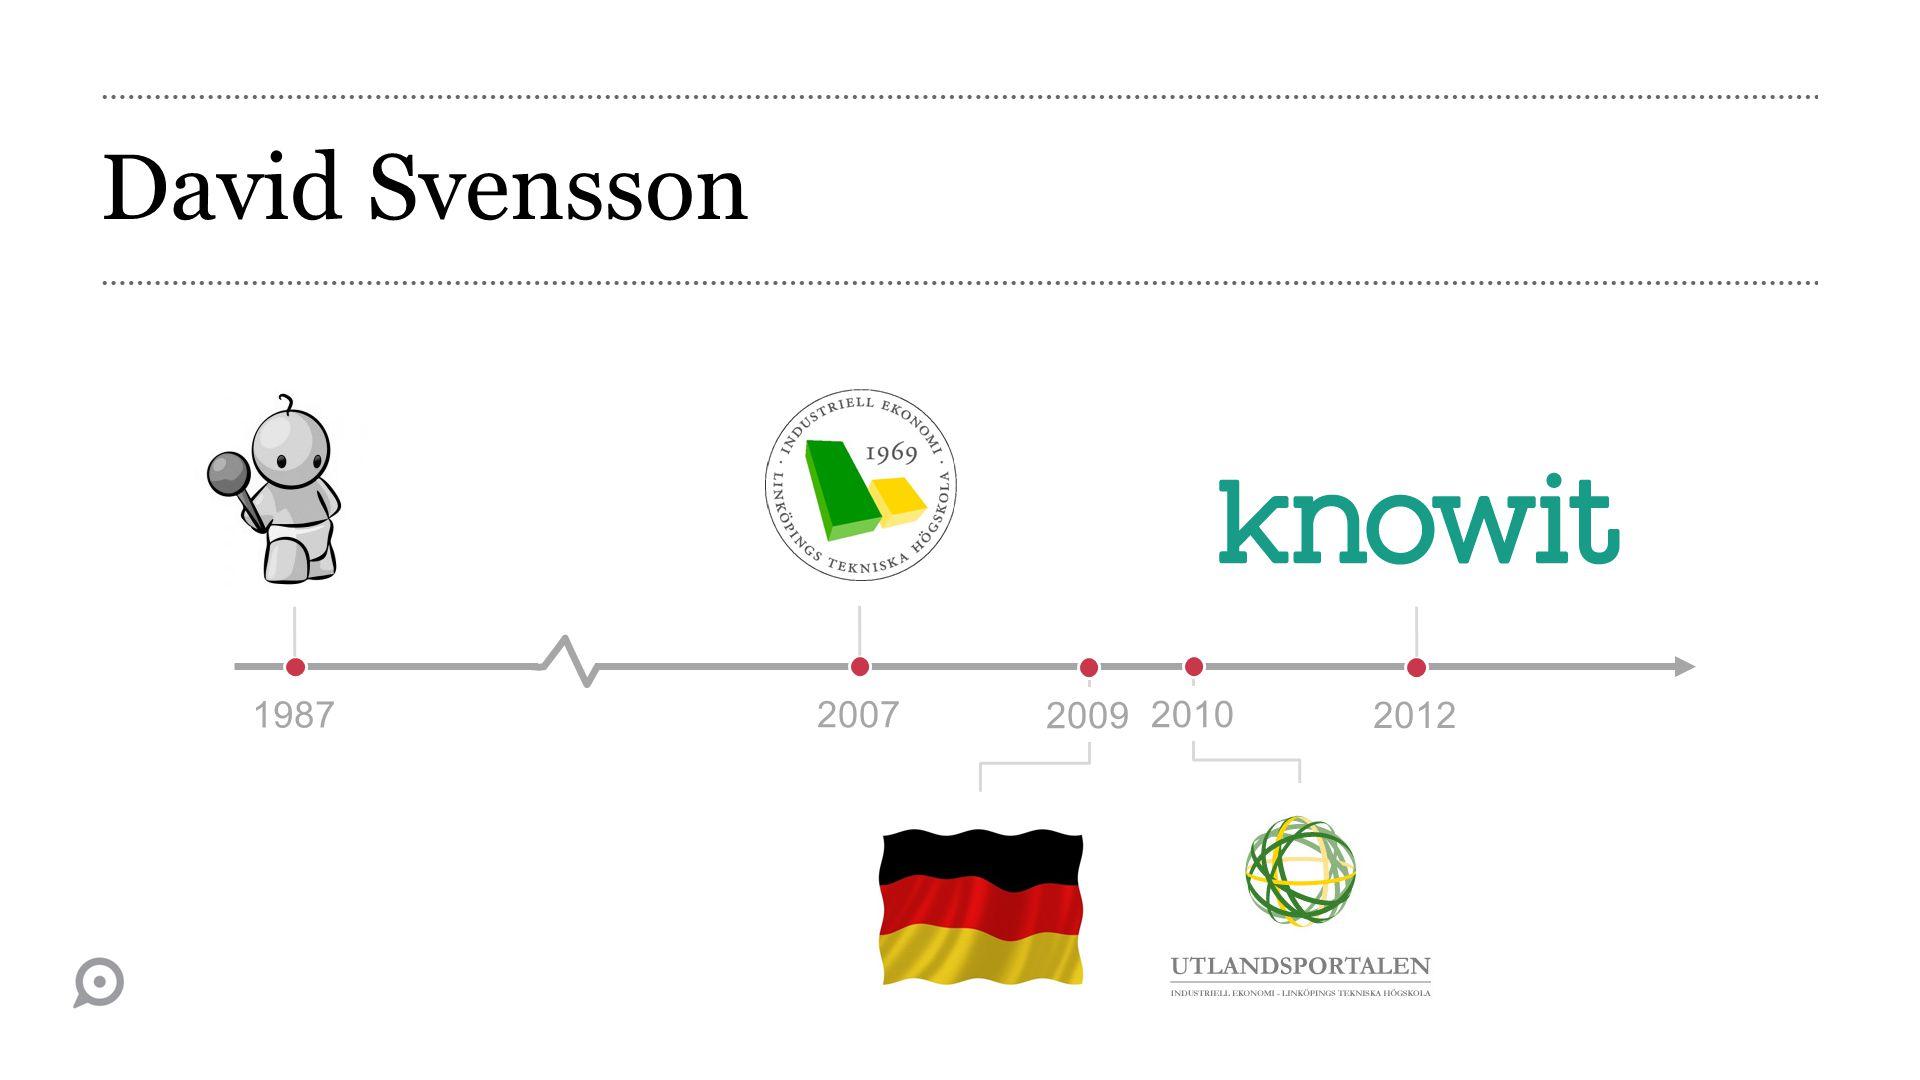 David Svensson 1987 2007 2010 2012 2009